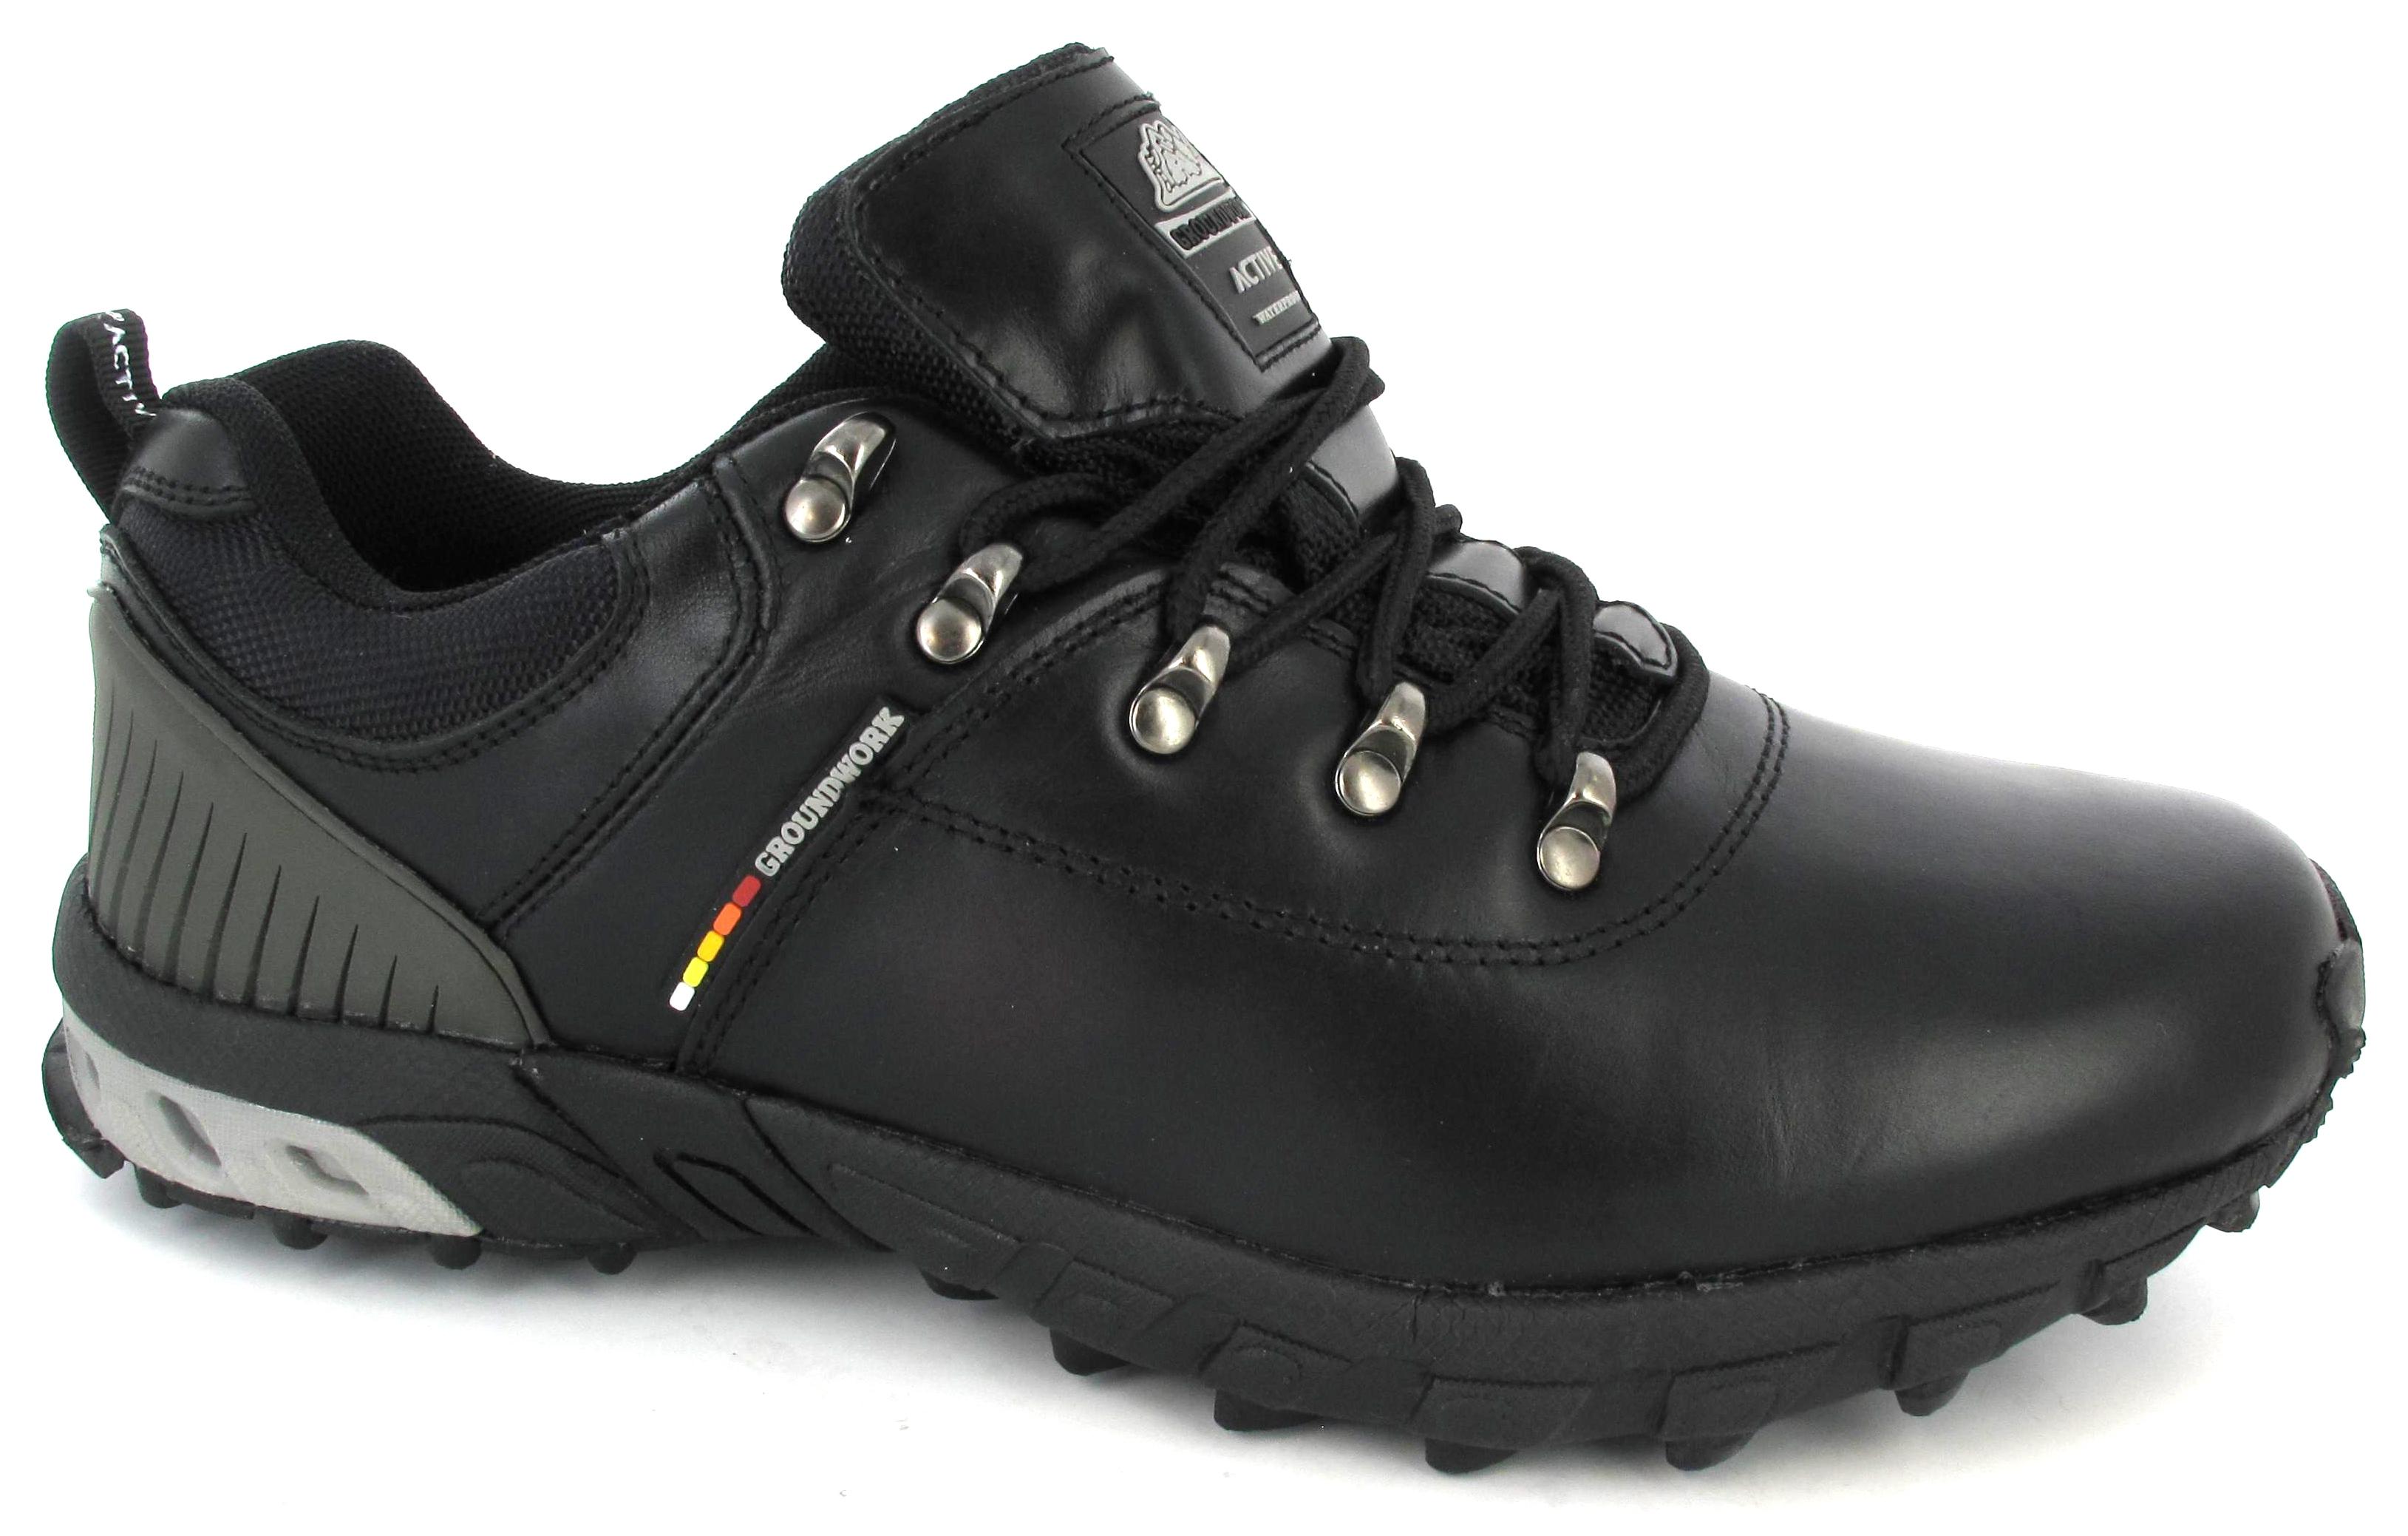 MENS-HIKING-WALKING-WATERPROOF-BOOTS-WINTER-MOUNTAIN-TREKKING-TRAIL-TRAINERS